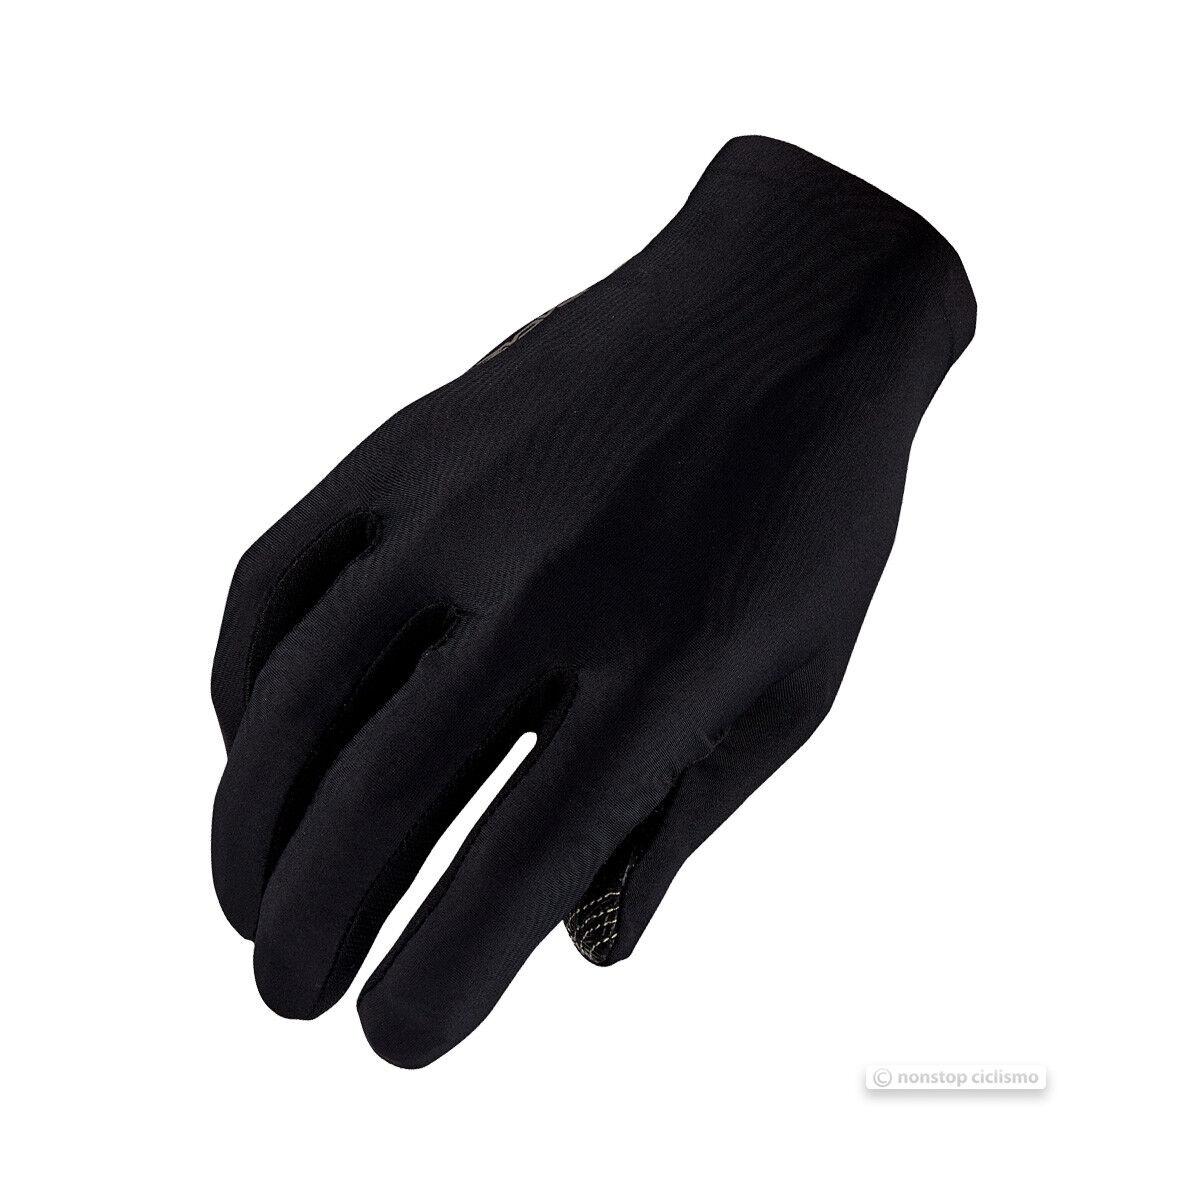 Supacaz supag largos dedos Completos Guantes de ciclismo  negroOUT   mejor precio